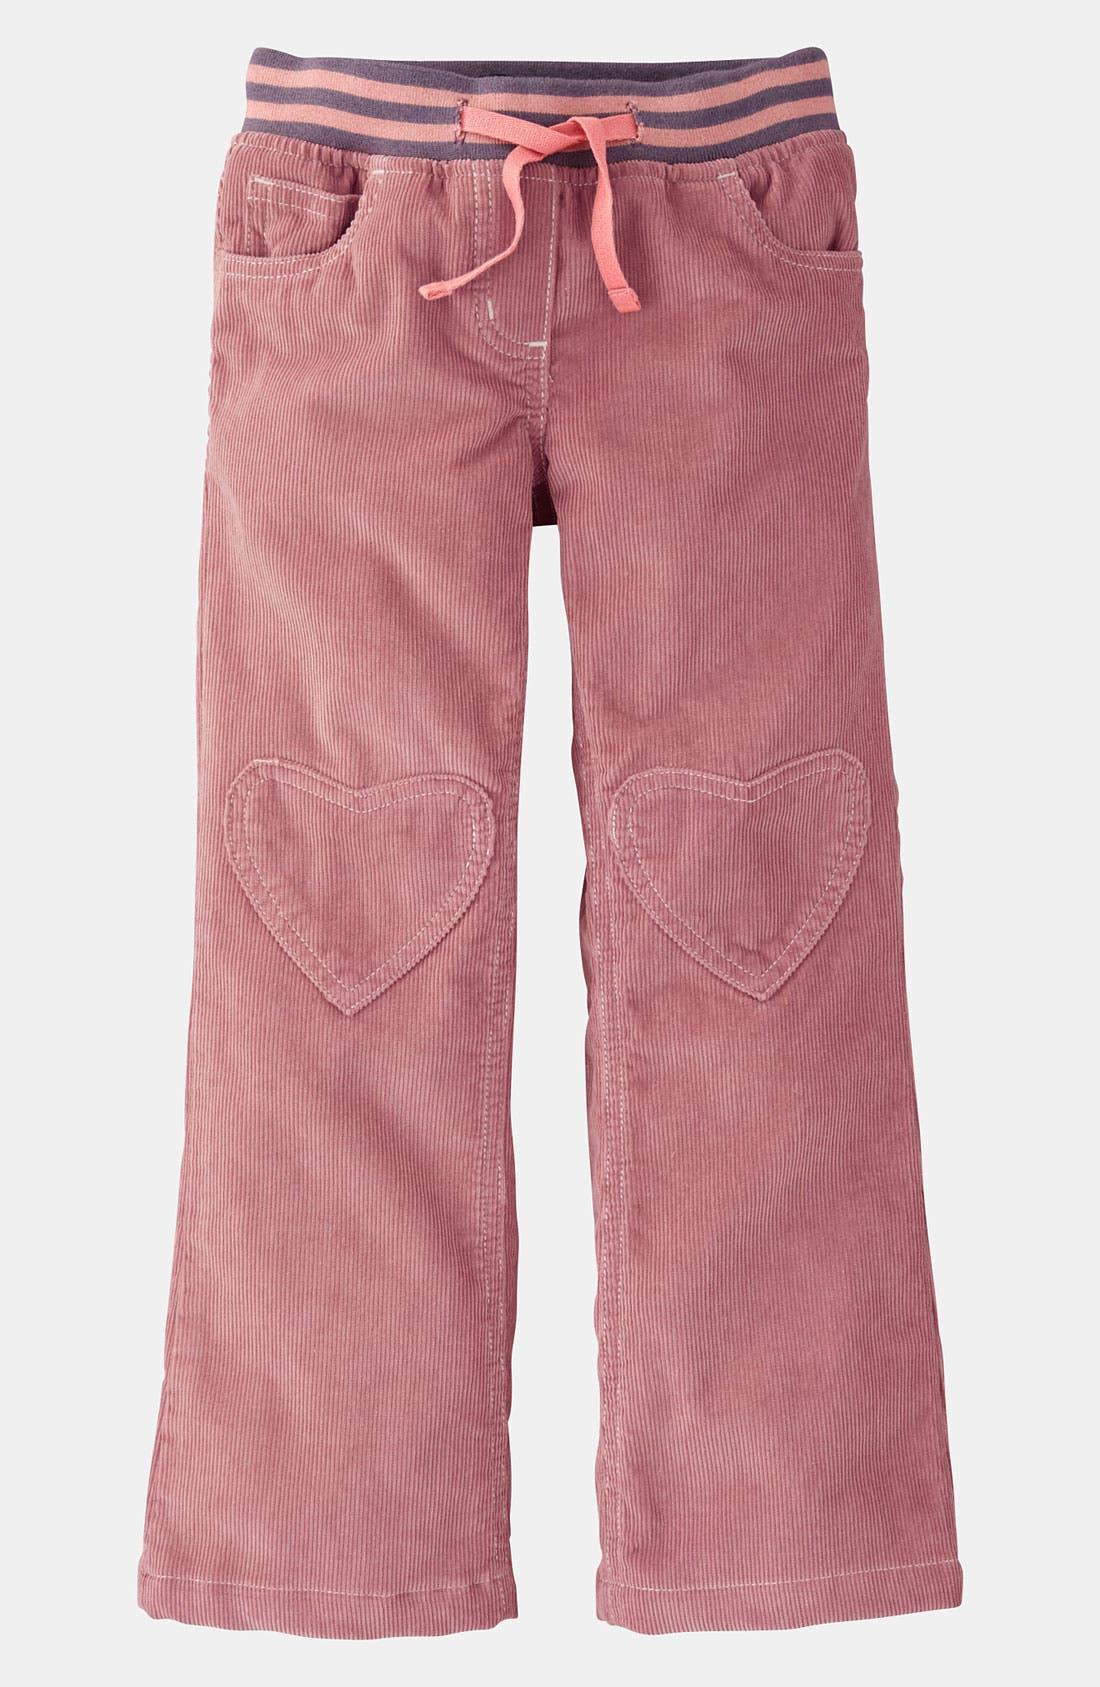 Main Image - Mini Boden Heart Patch Pants (Toddler, Little Girls & Big Girls)